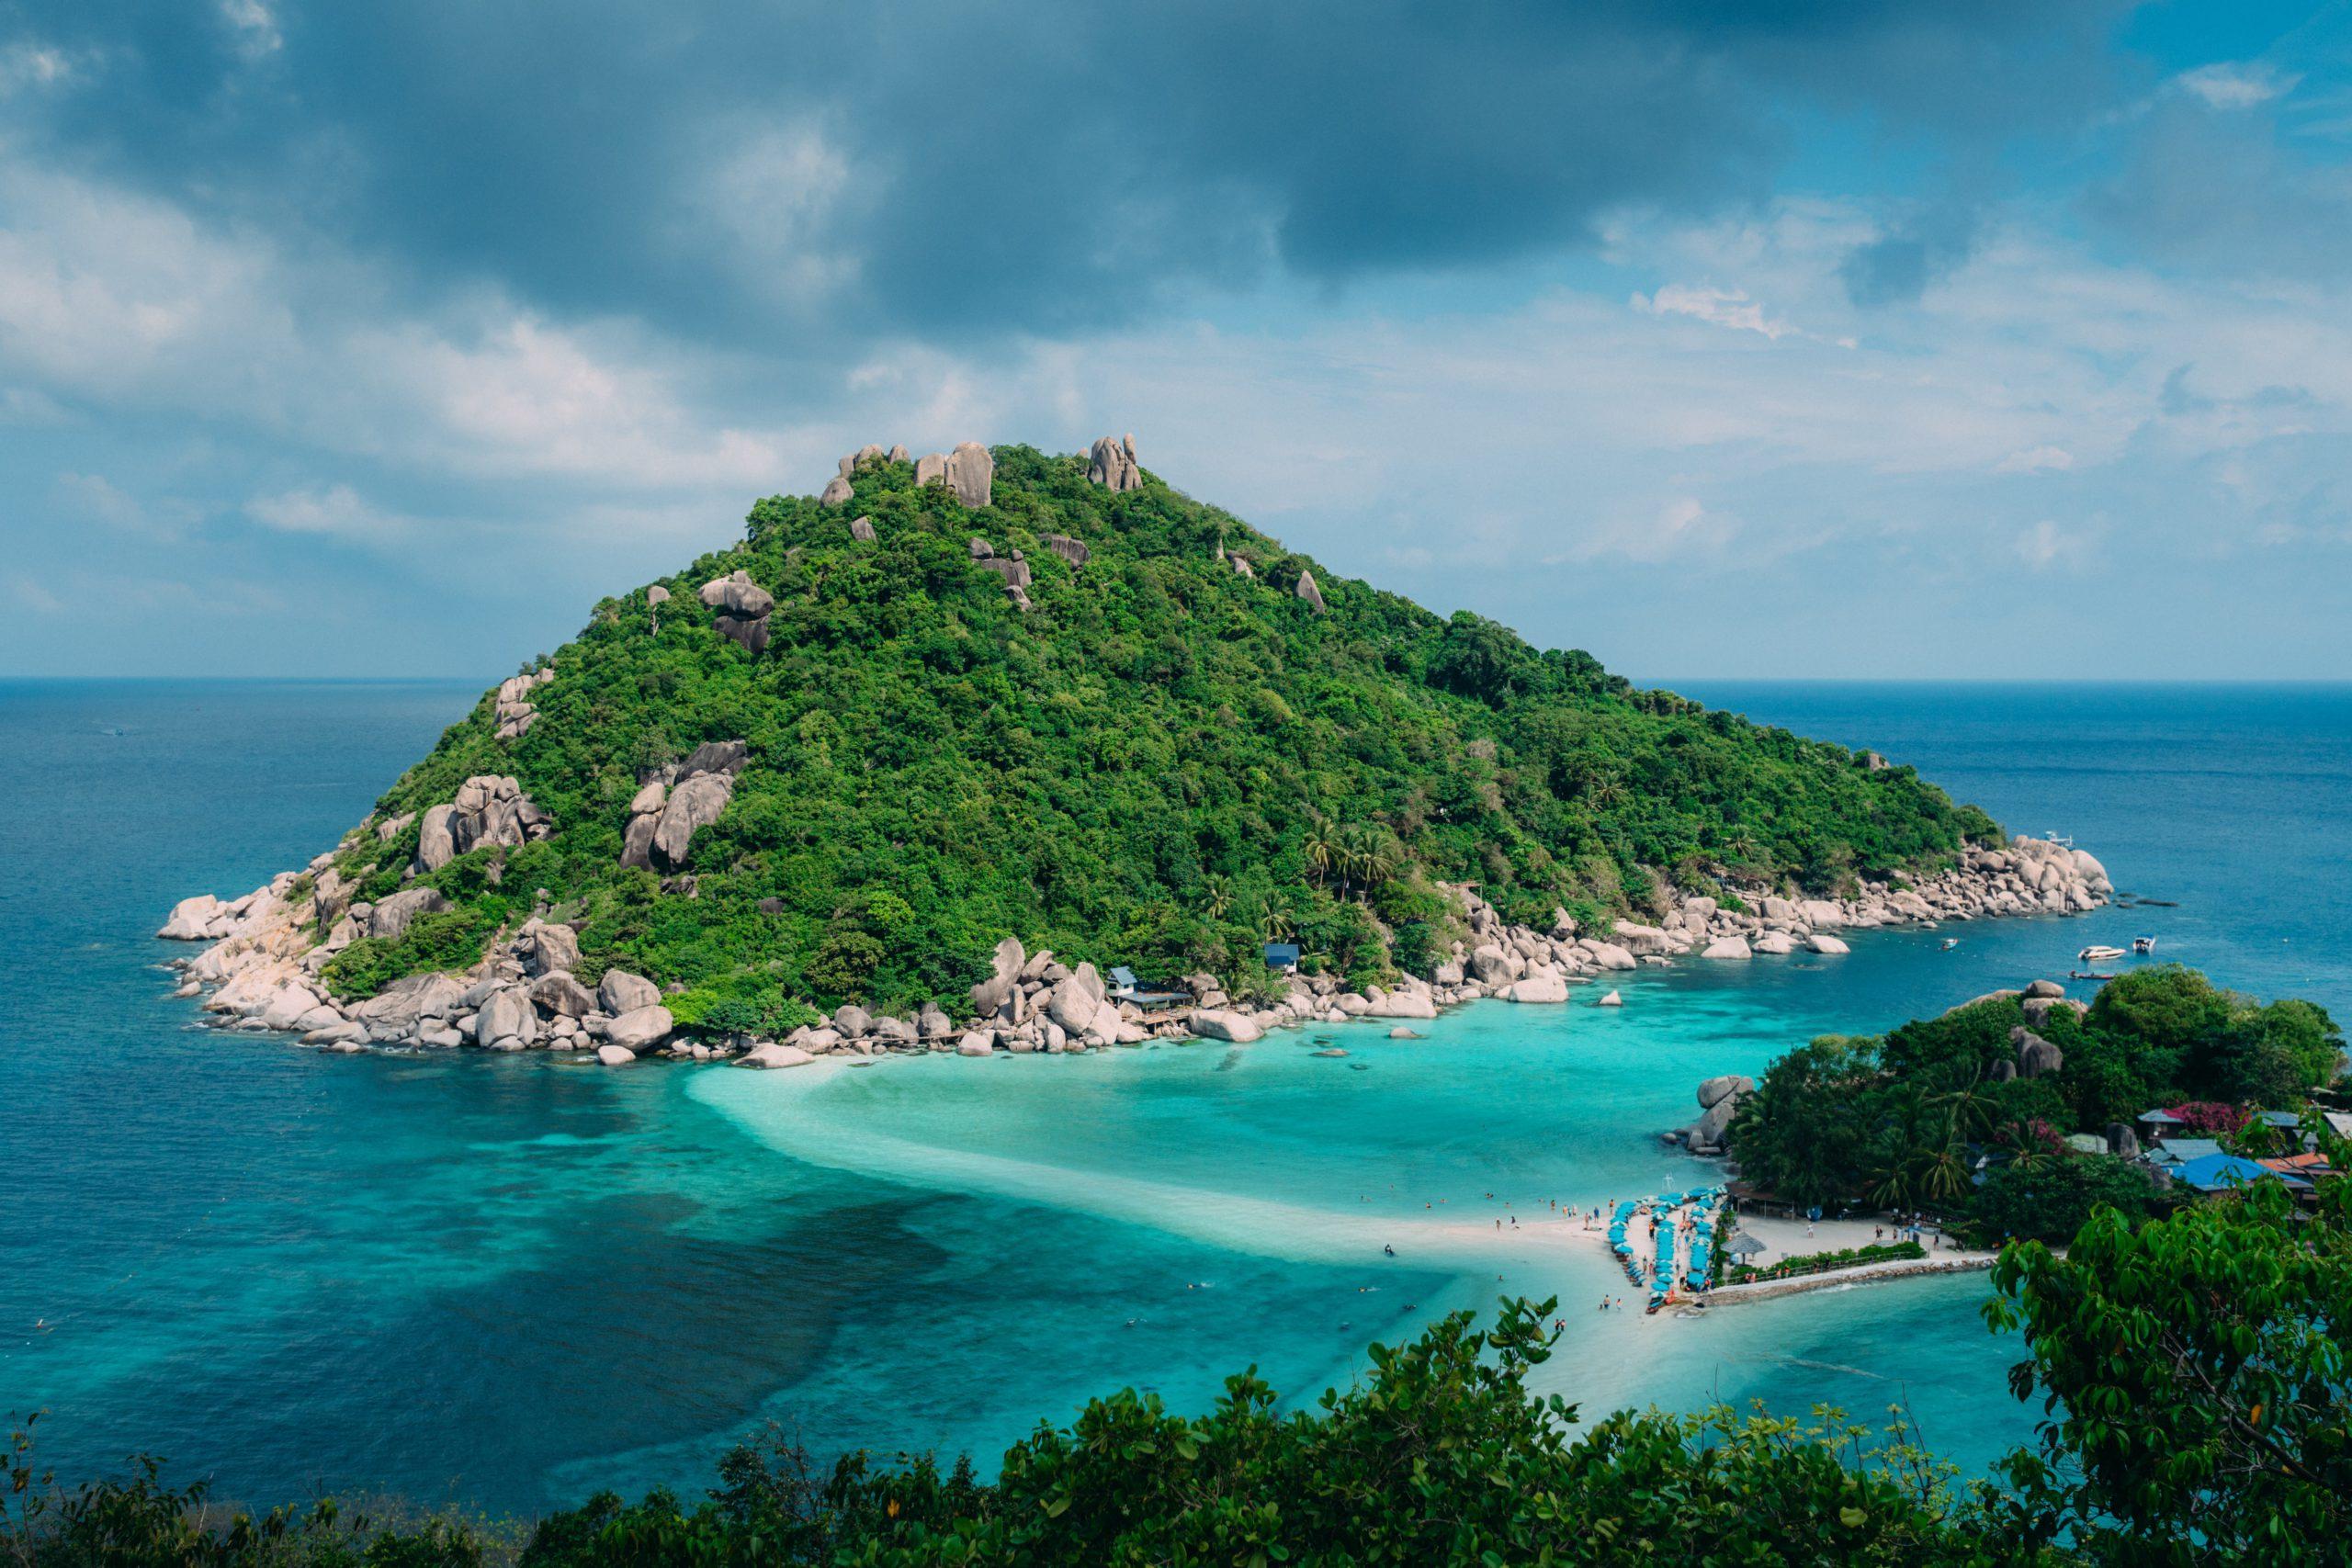 Photo of Koh Samui, an island in Thailand.